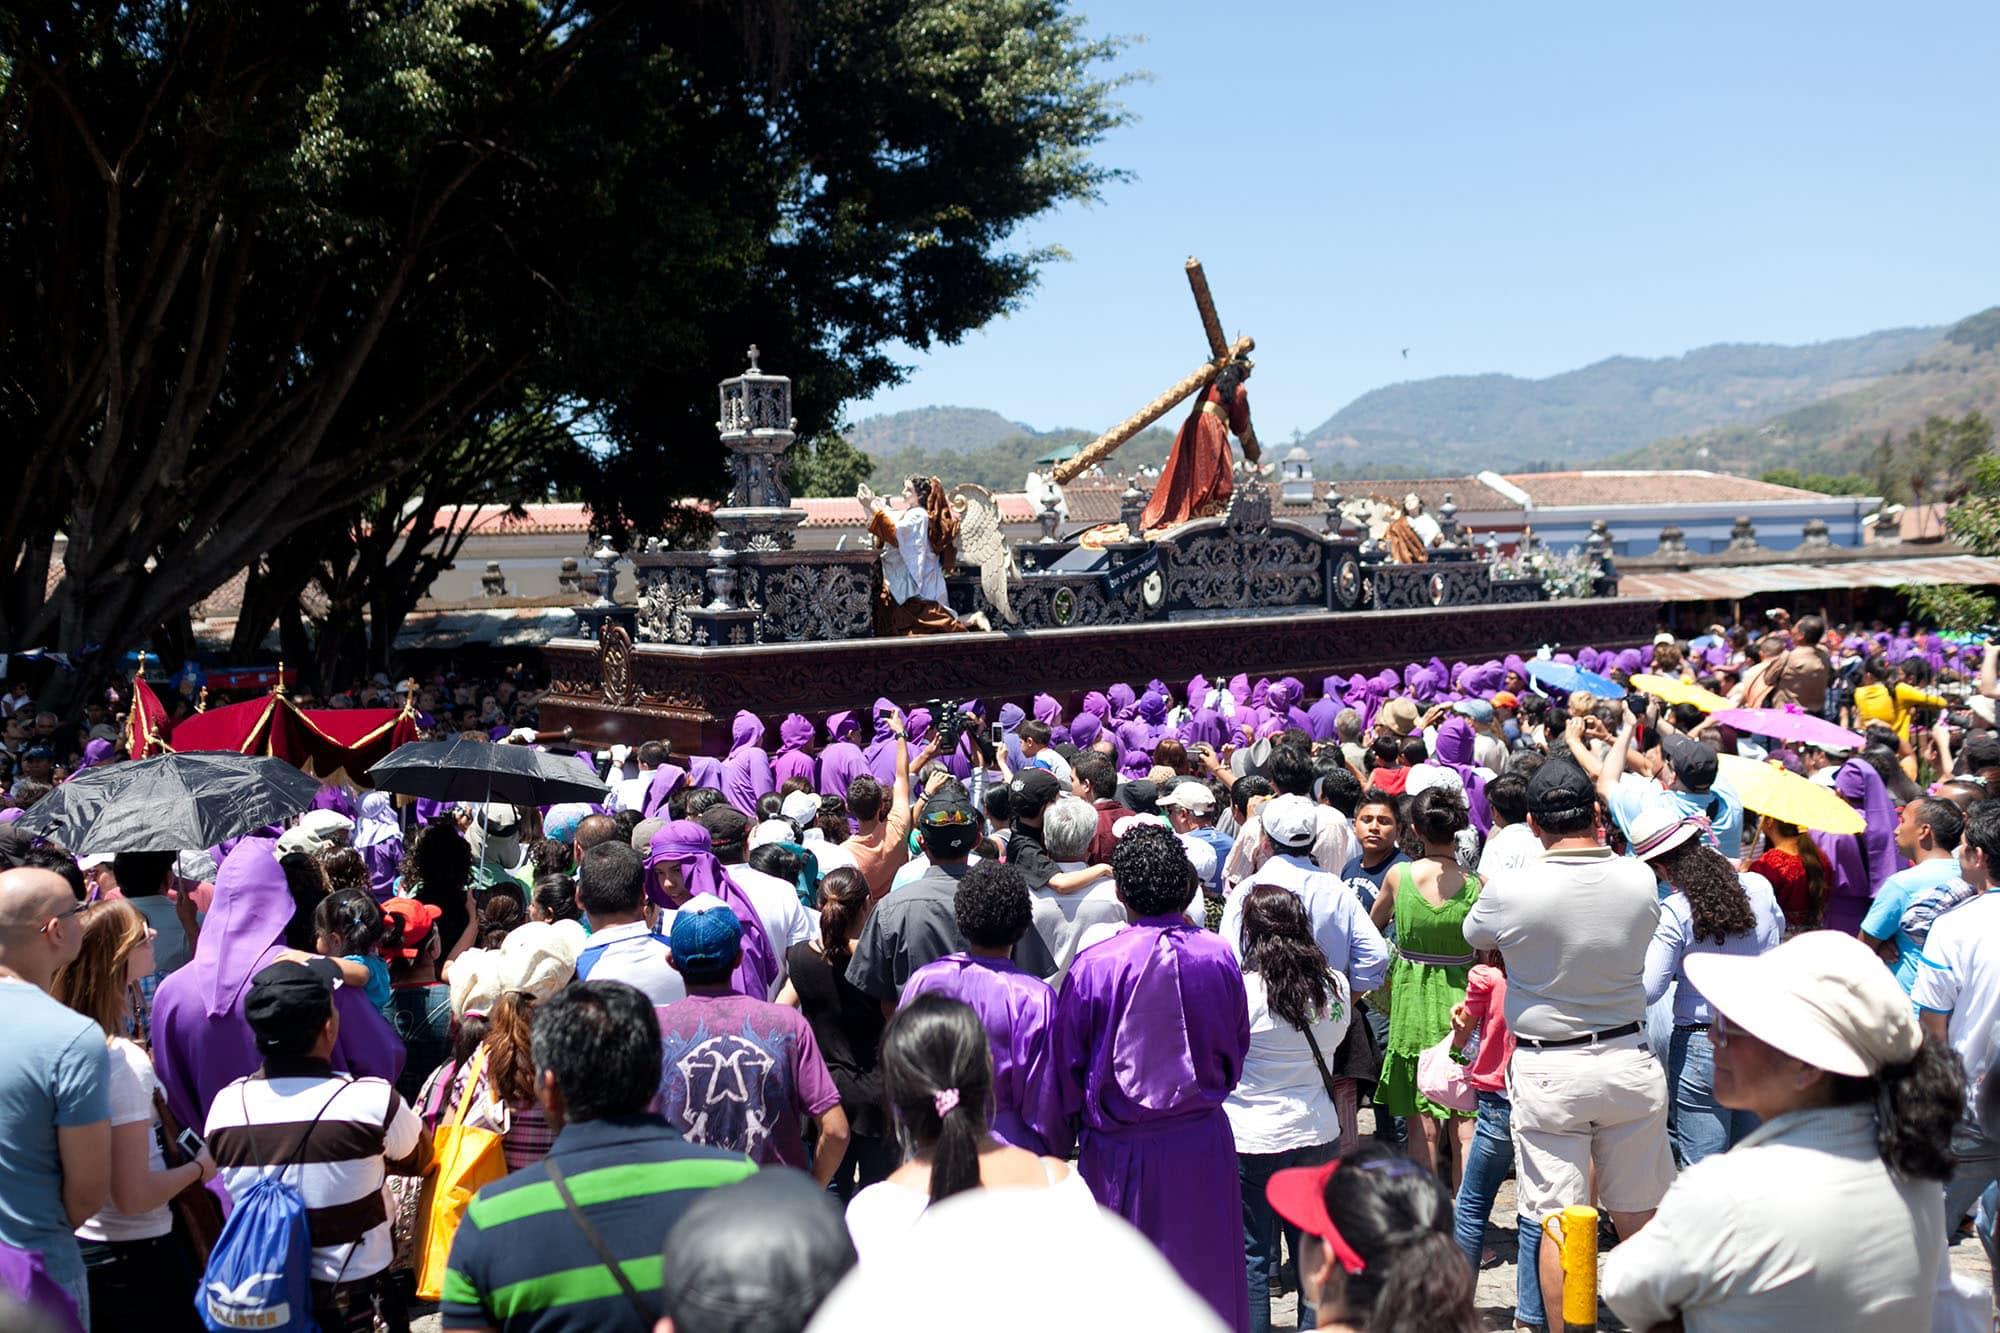 Semana Santa Processions in Antingua, Guatemala.